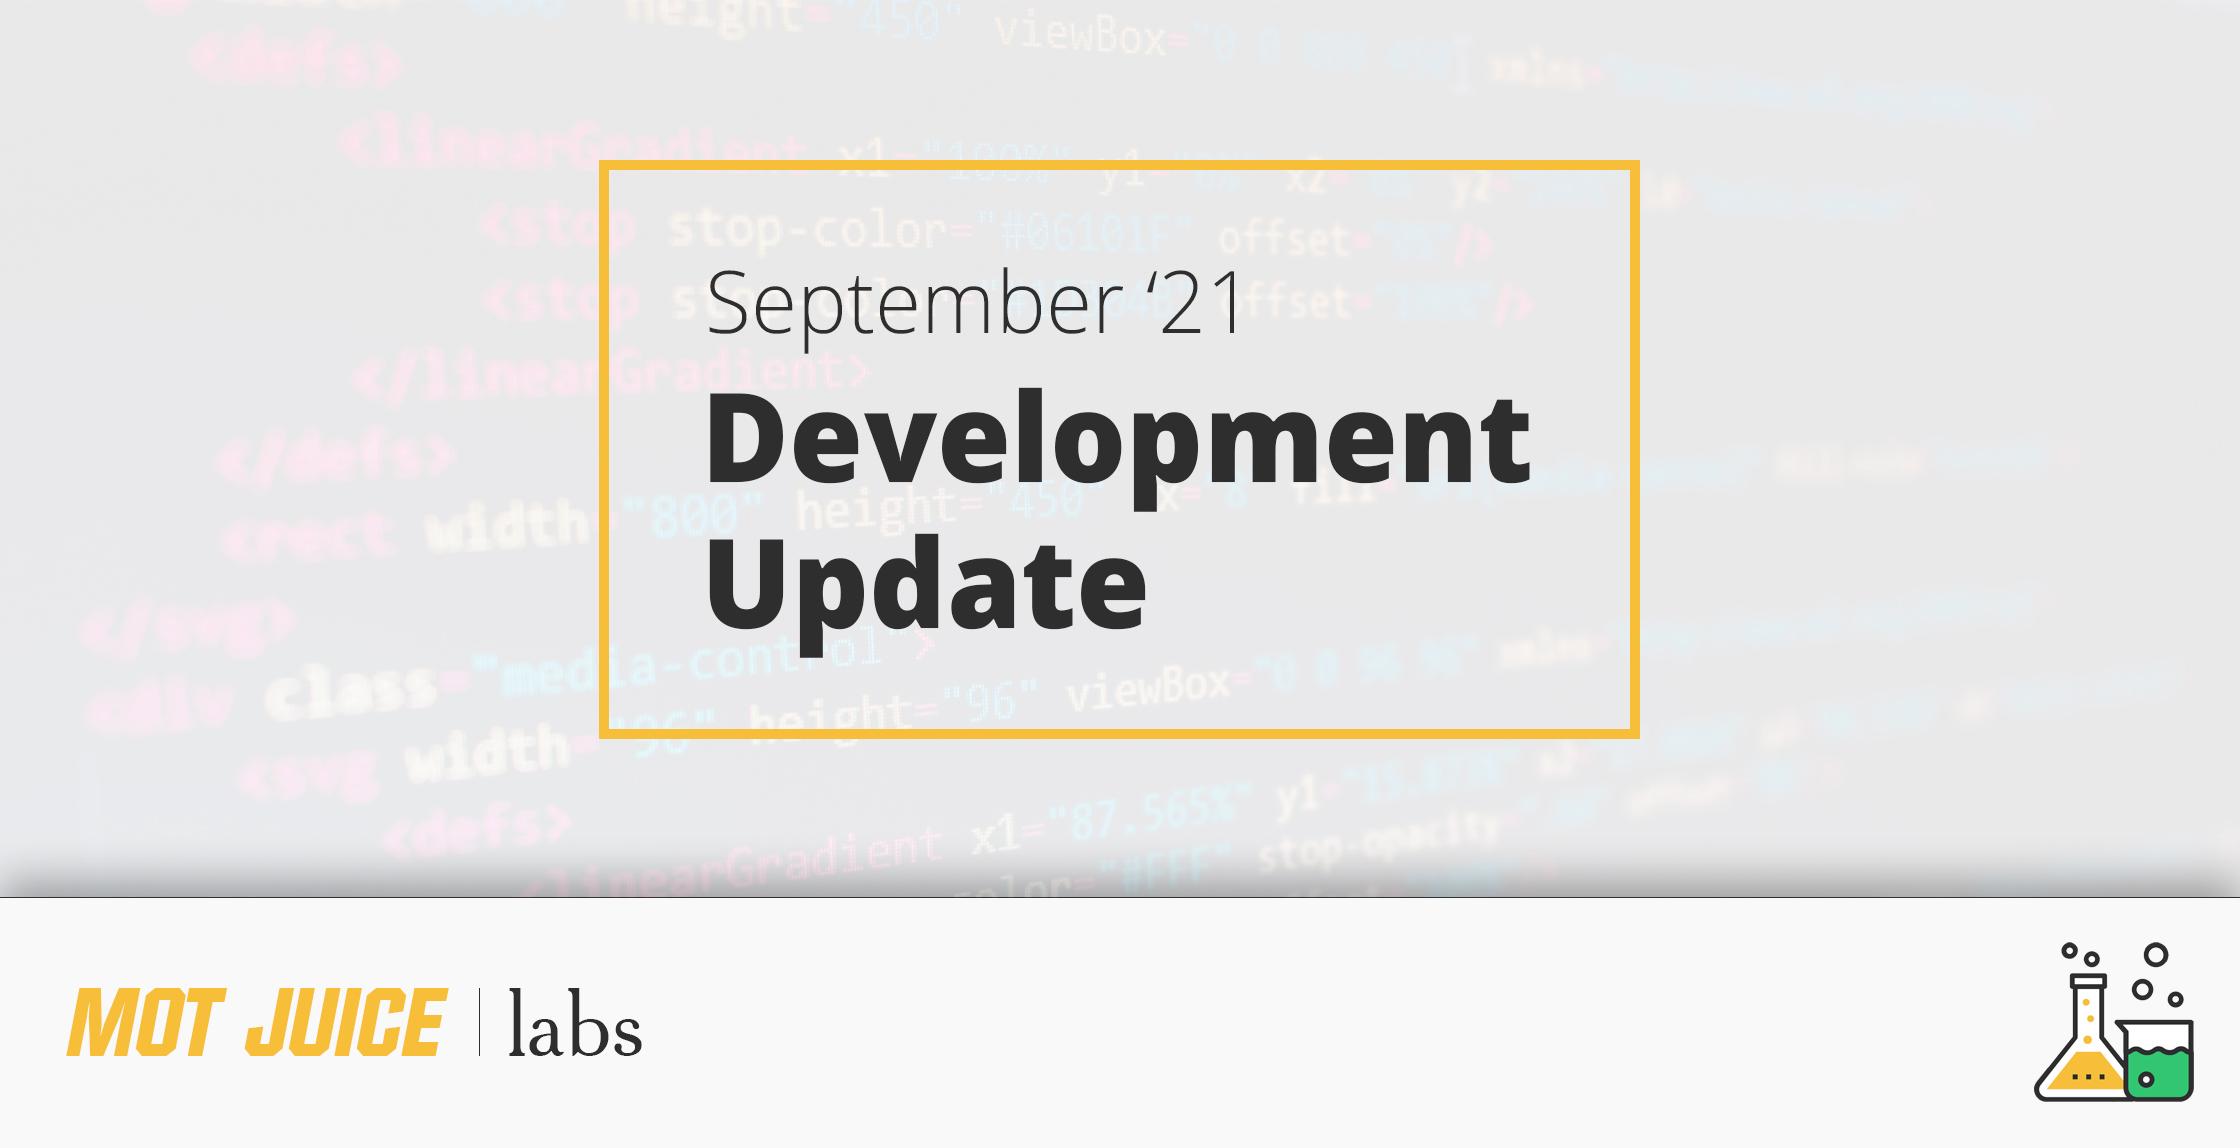 Development Update – September '21